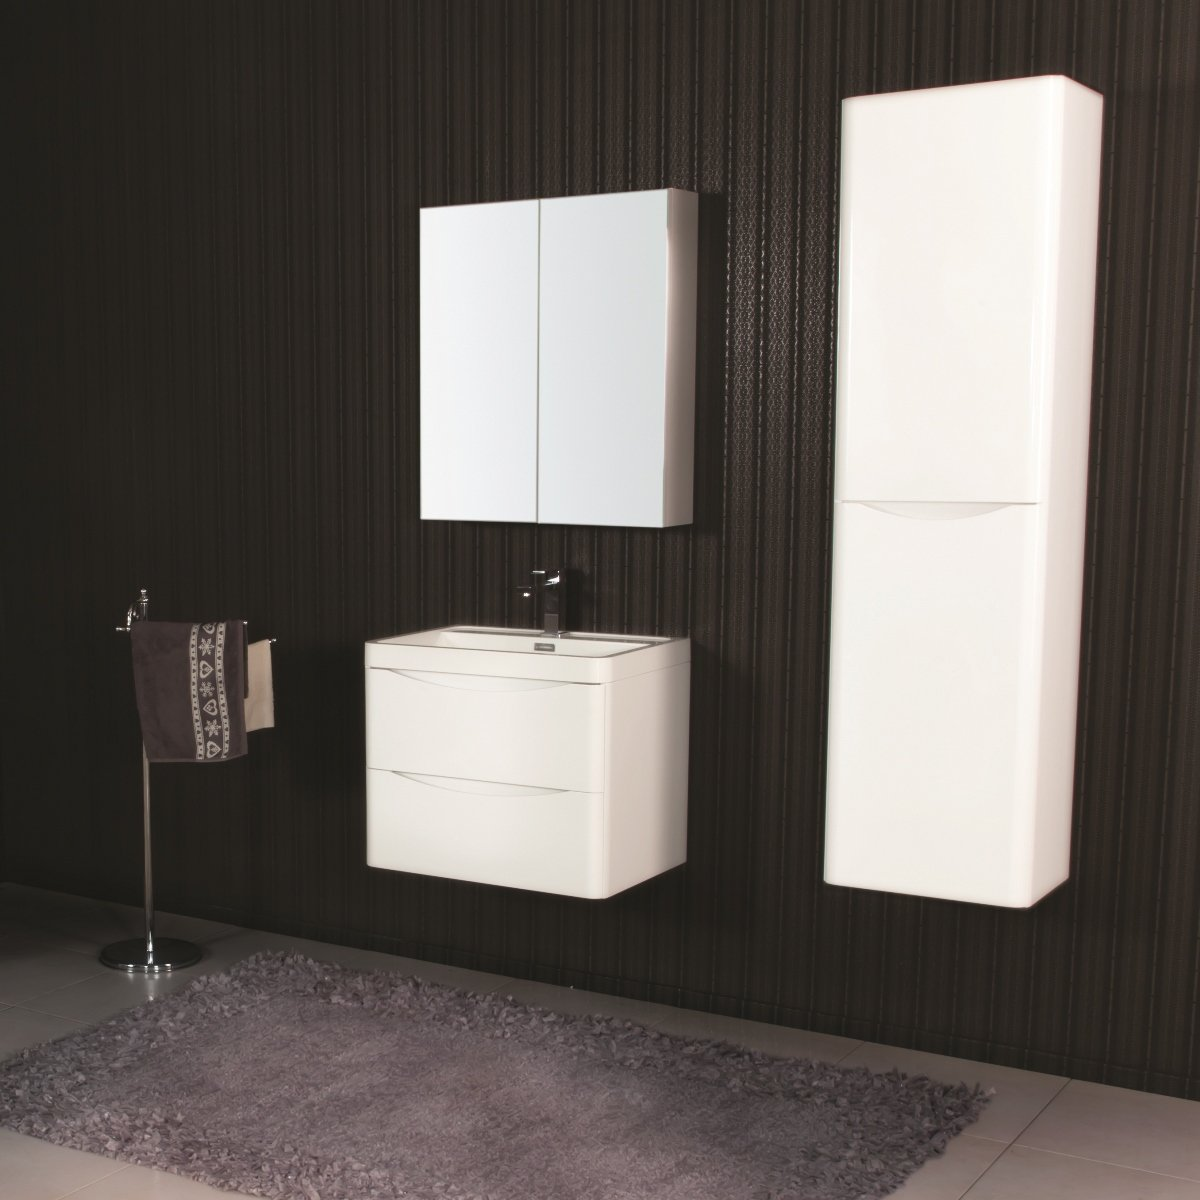 Best mobili bagno 60 cm pictures for Bagno mobile specchio